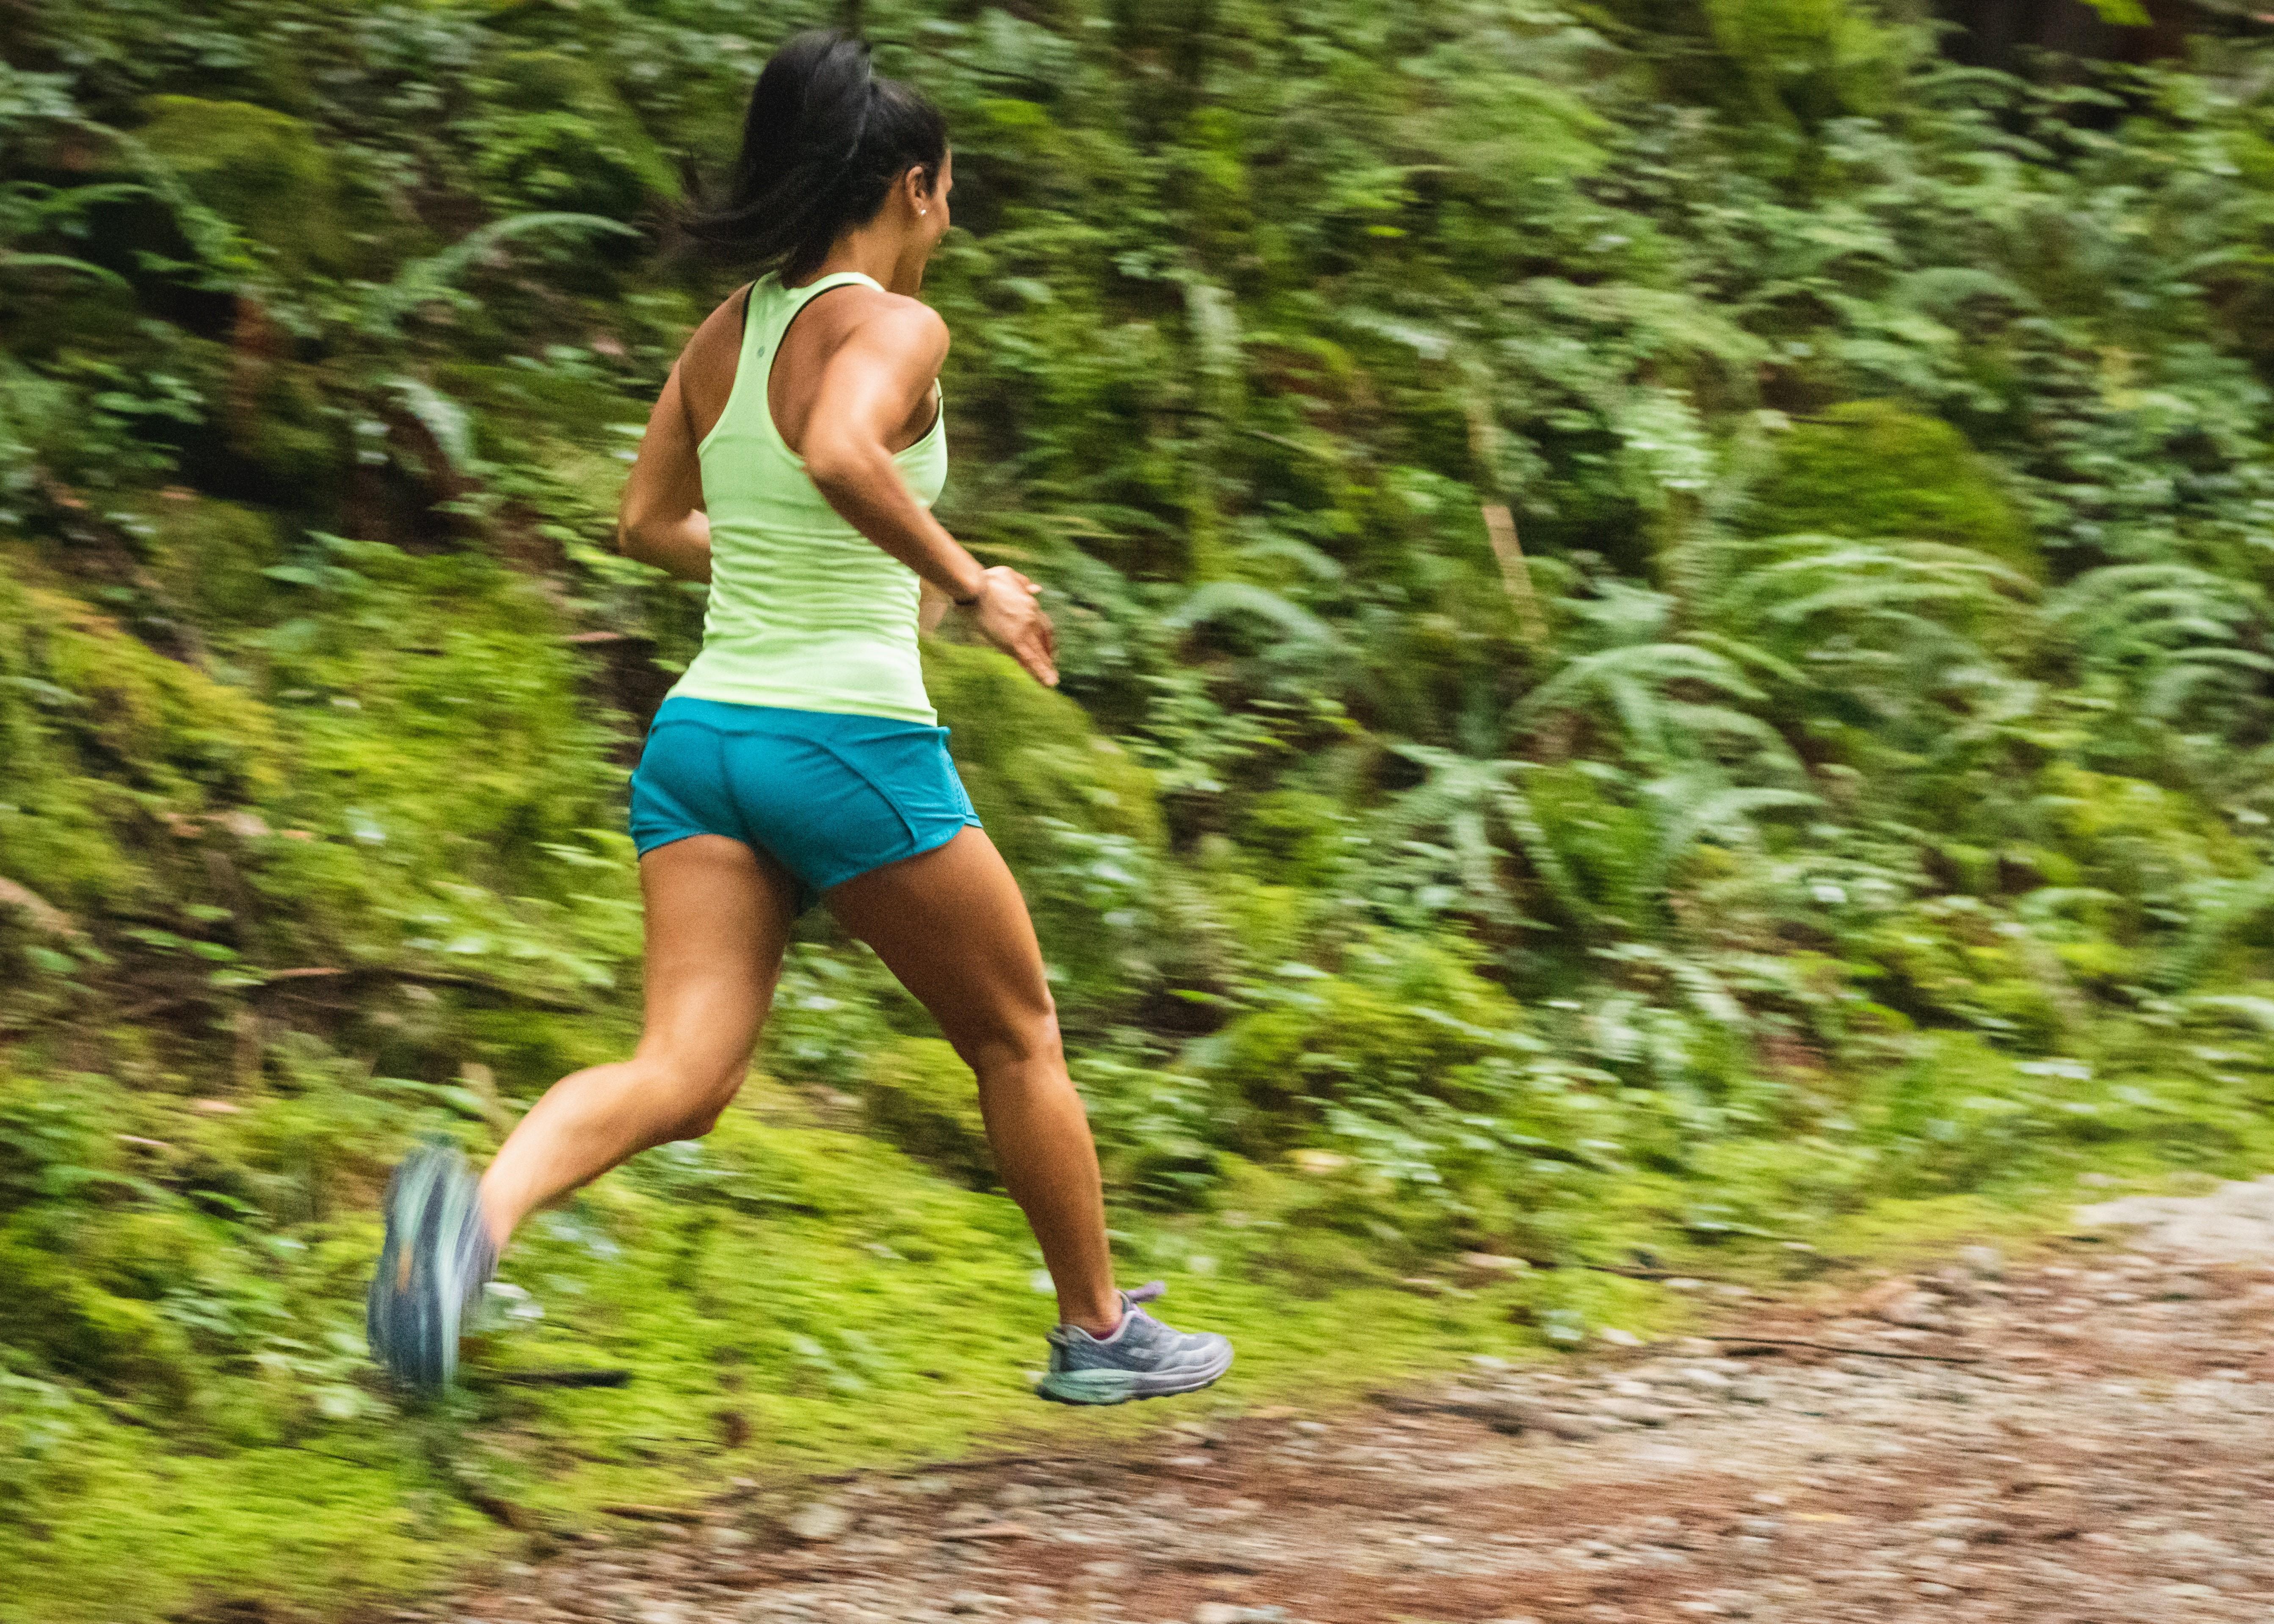 Incluir exercícios físicos intensos na rotina pode aumentar longevidade (Foto: Greg Rosenke/Unsplash)